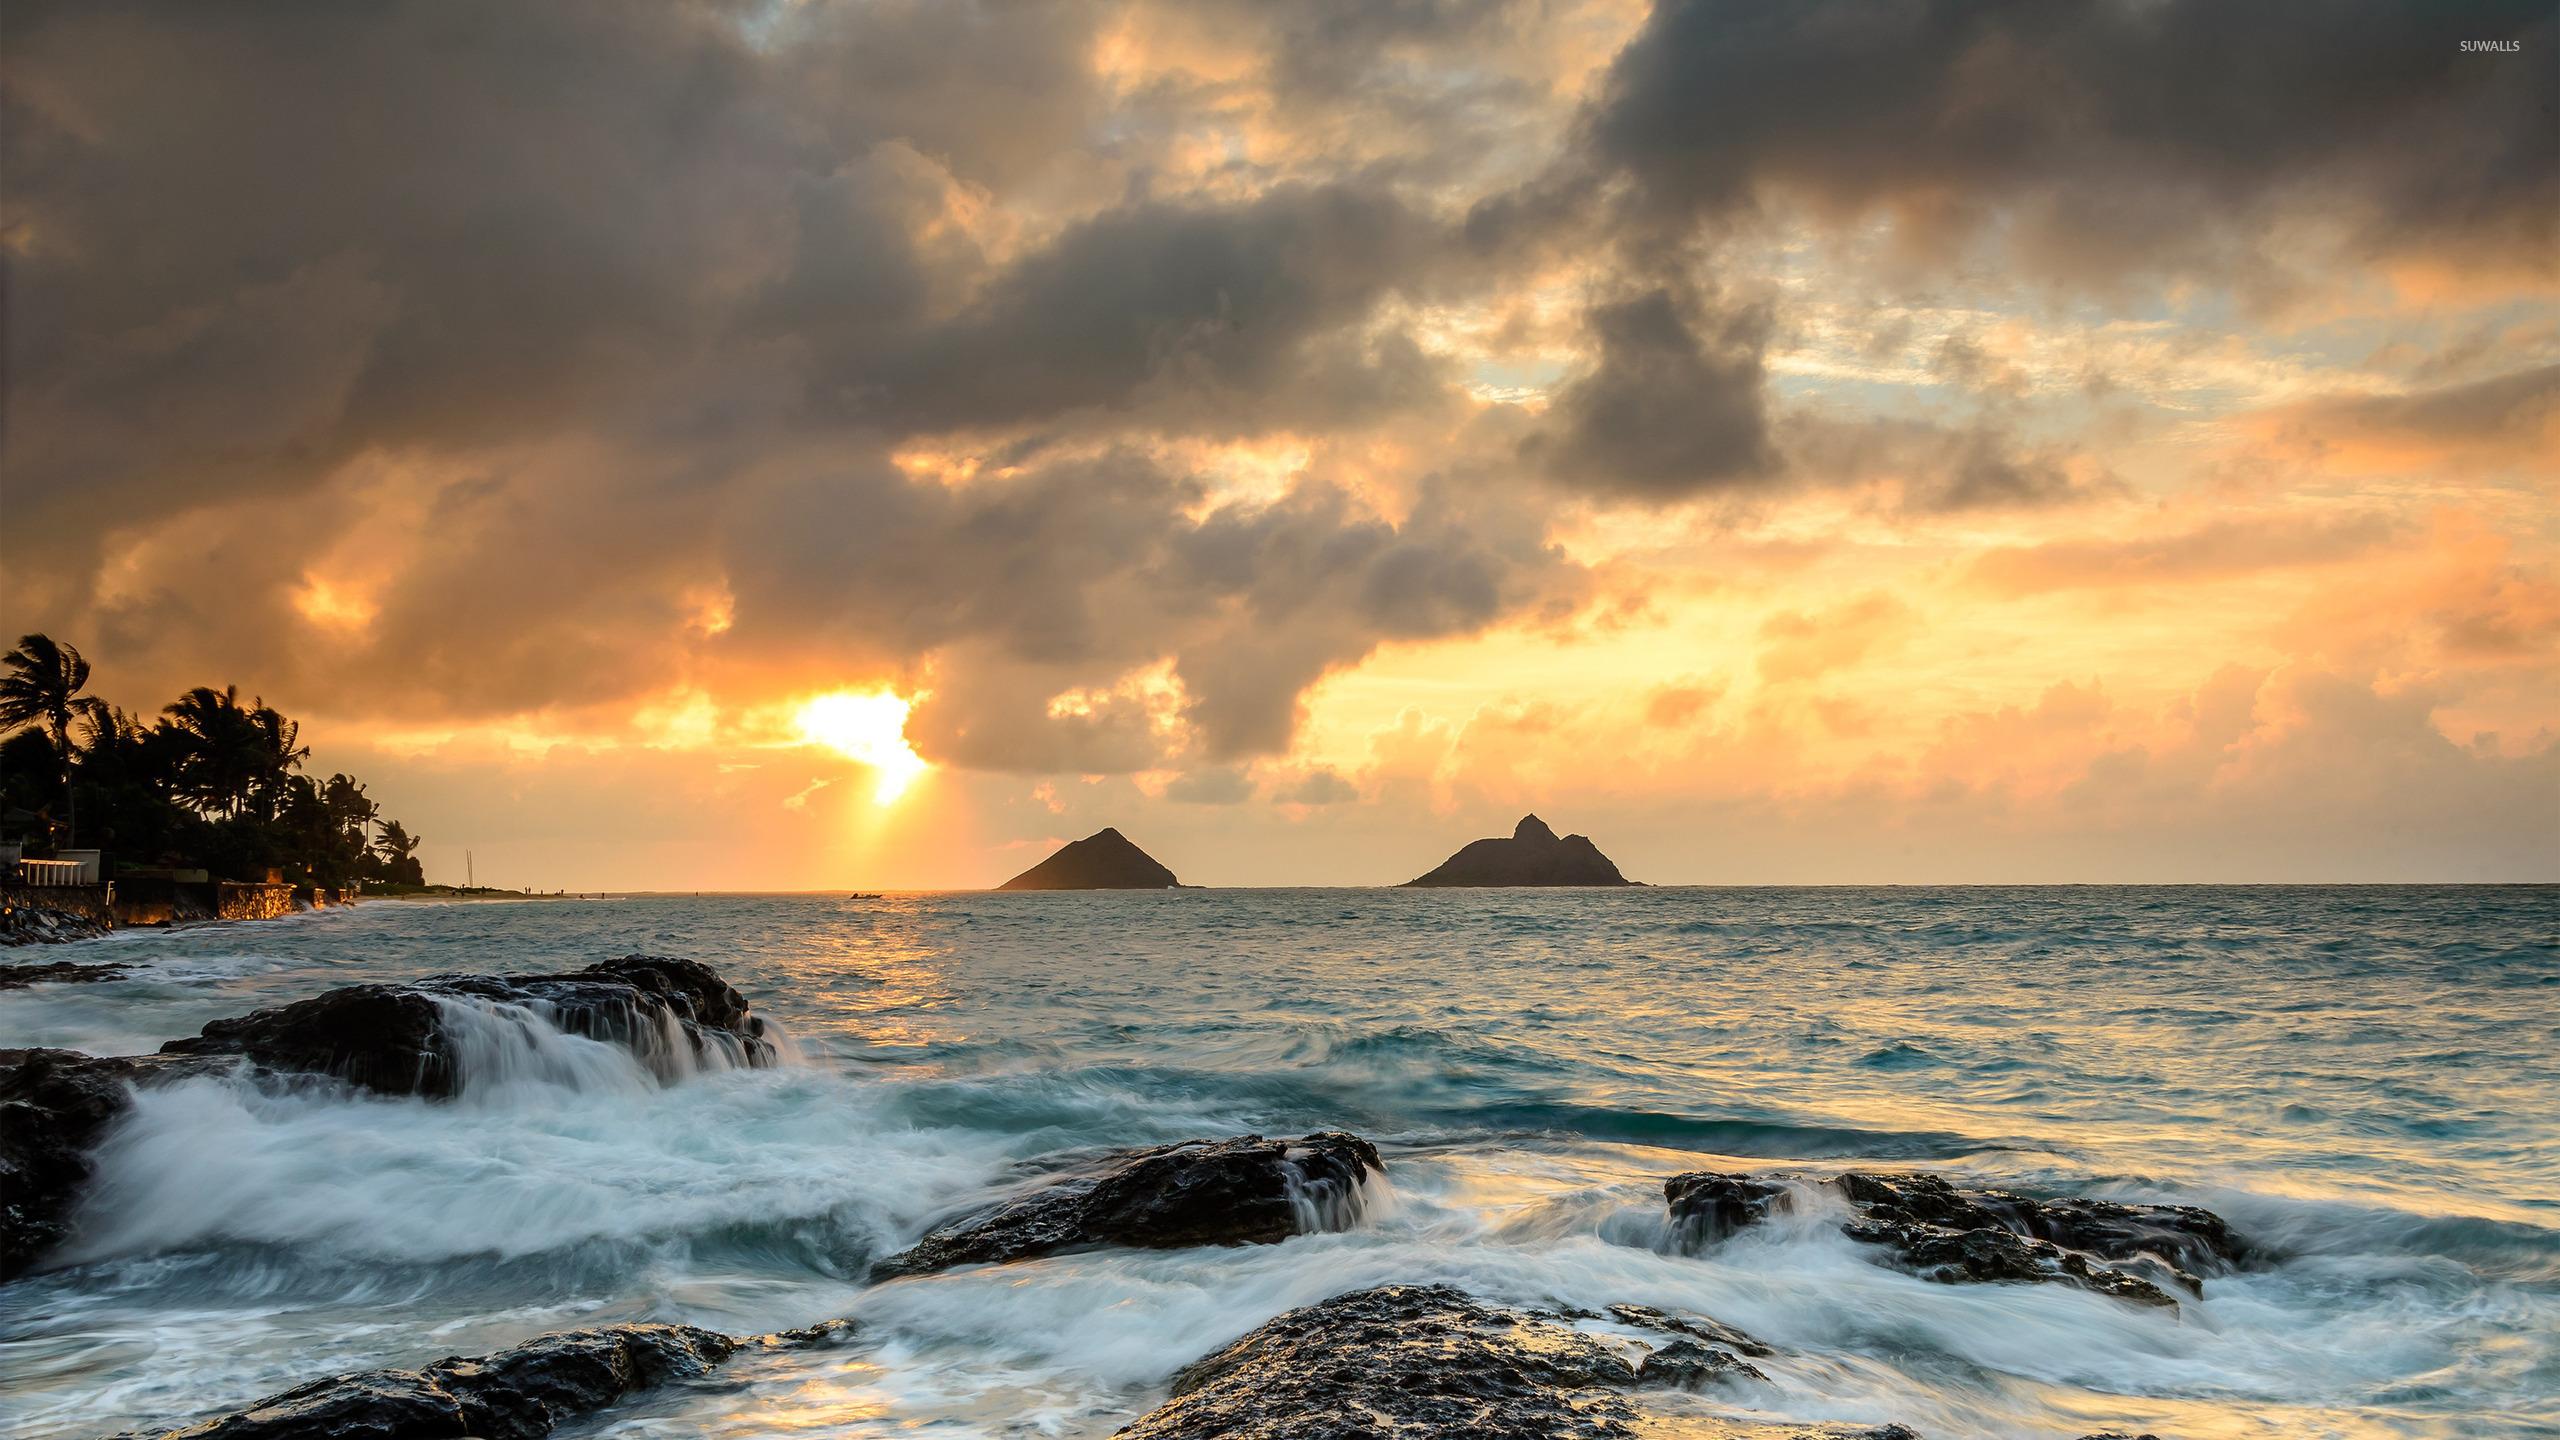 Sunrise At Lanikai Point, Hawaii Wallpaper